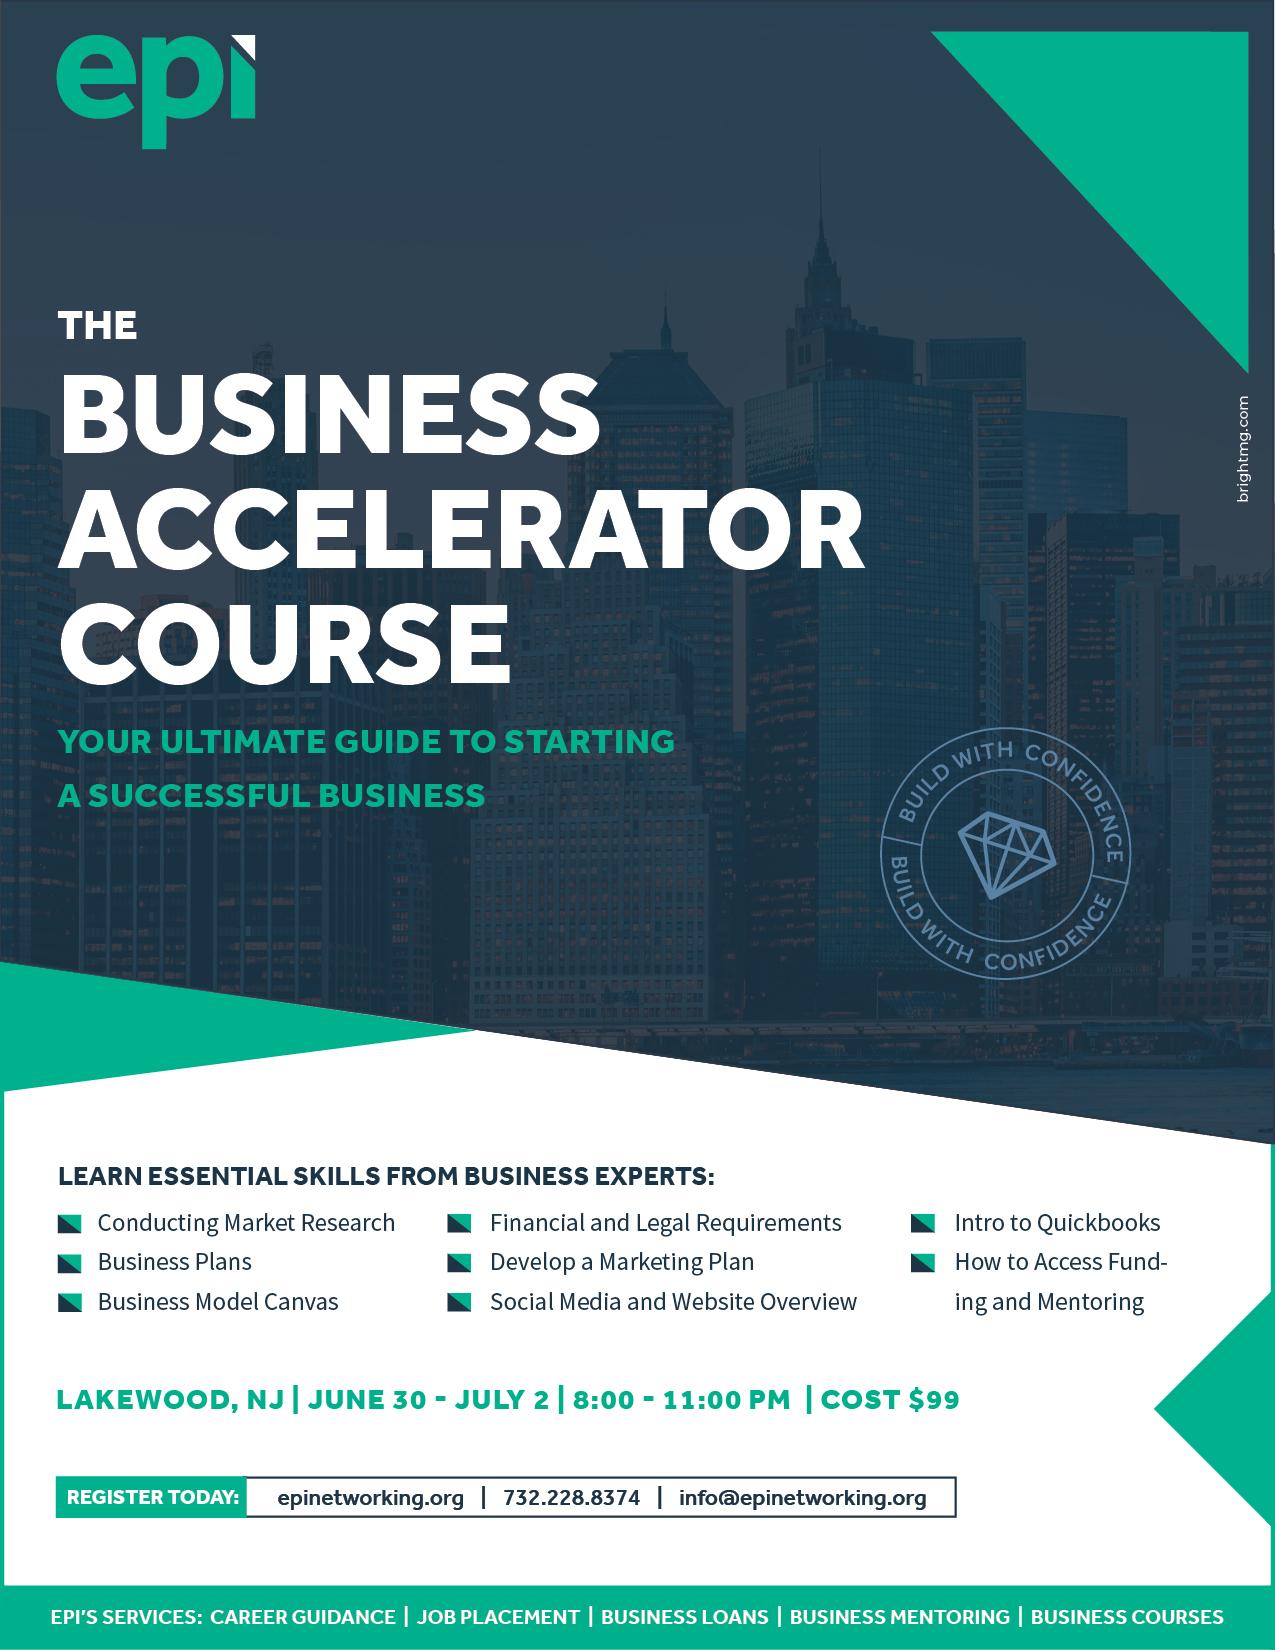 The Business Accelerator Course